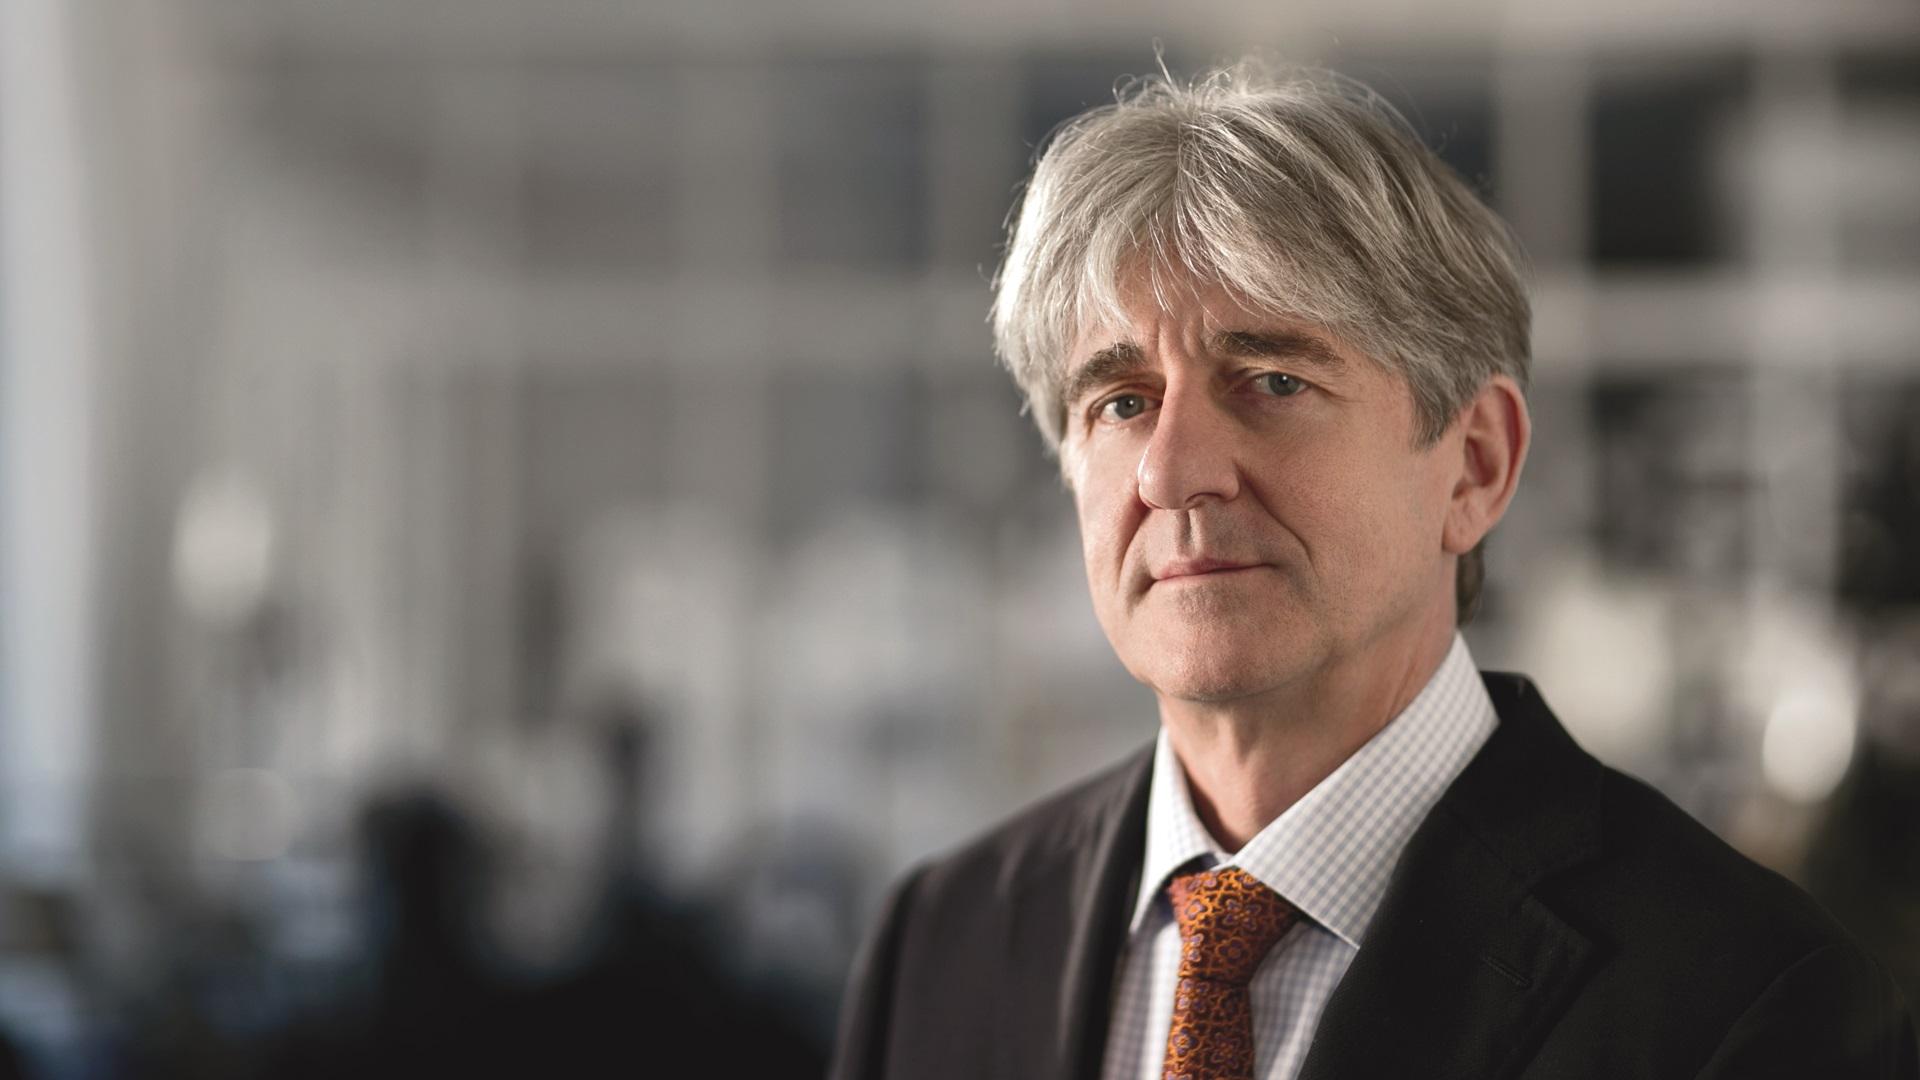 Jochen Benzinger